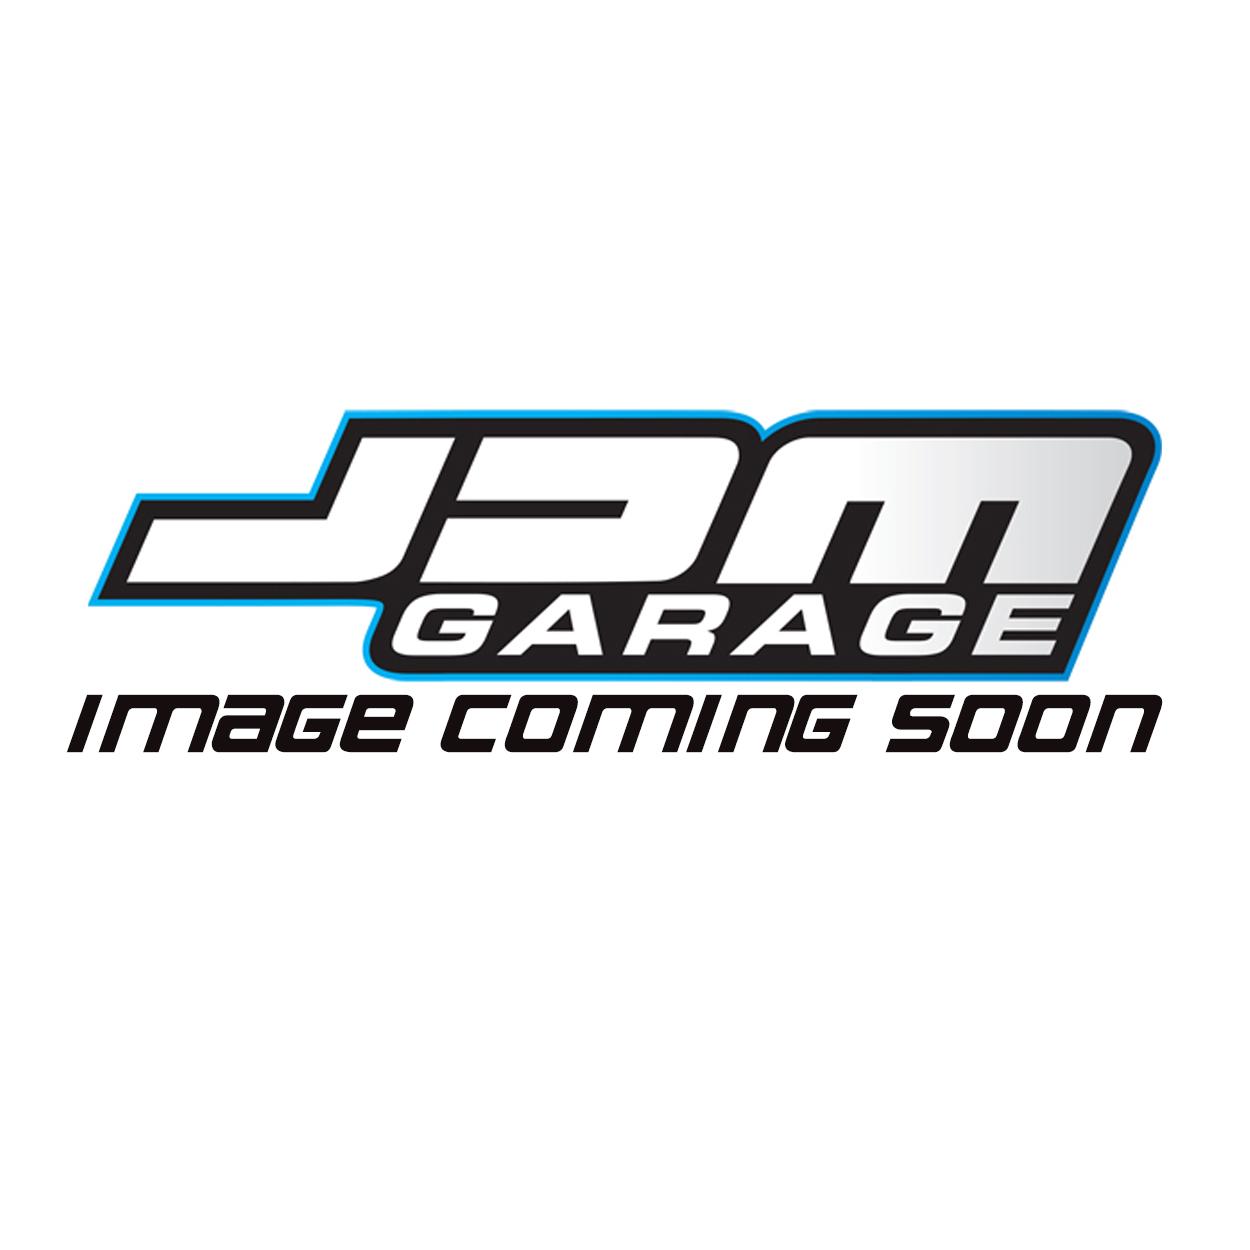 Haltech Elite 2500+ ECU Subaru GDB WRX MY01-05 With Plug 'n' Play Adaptor Harness Kit